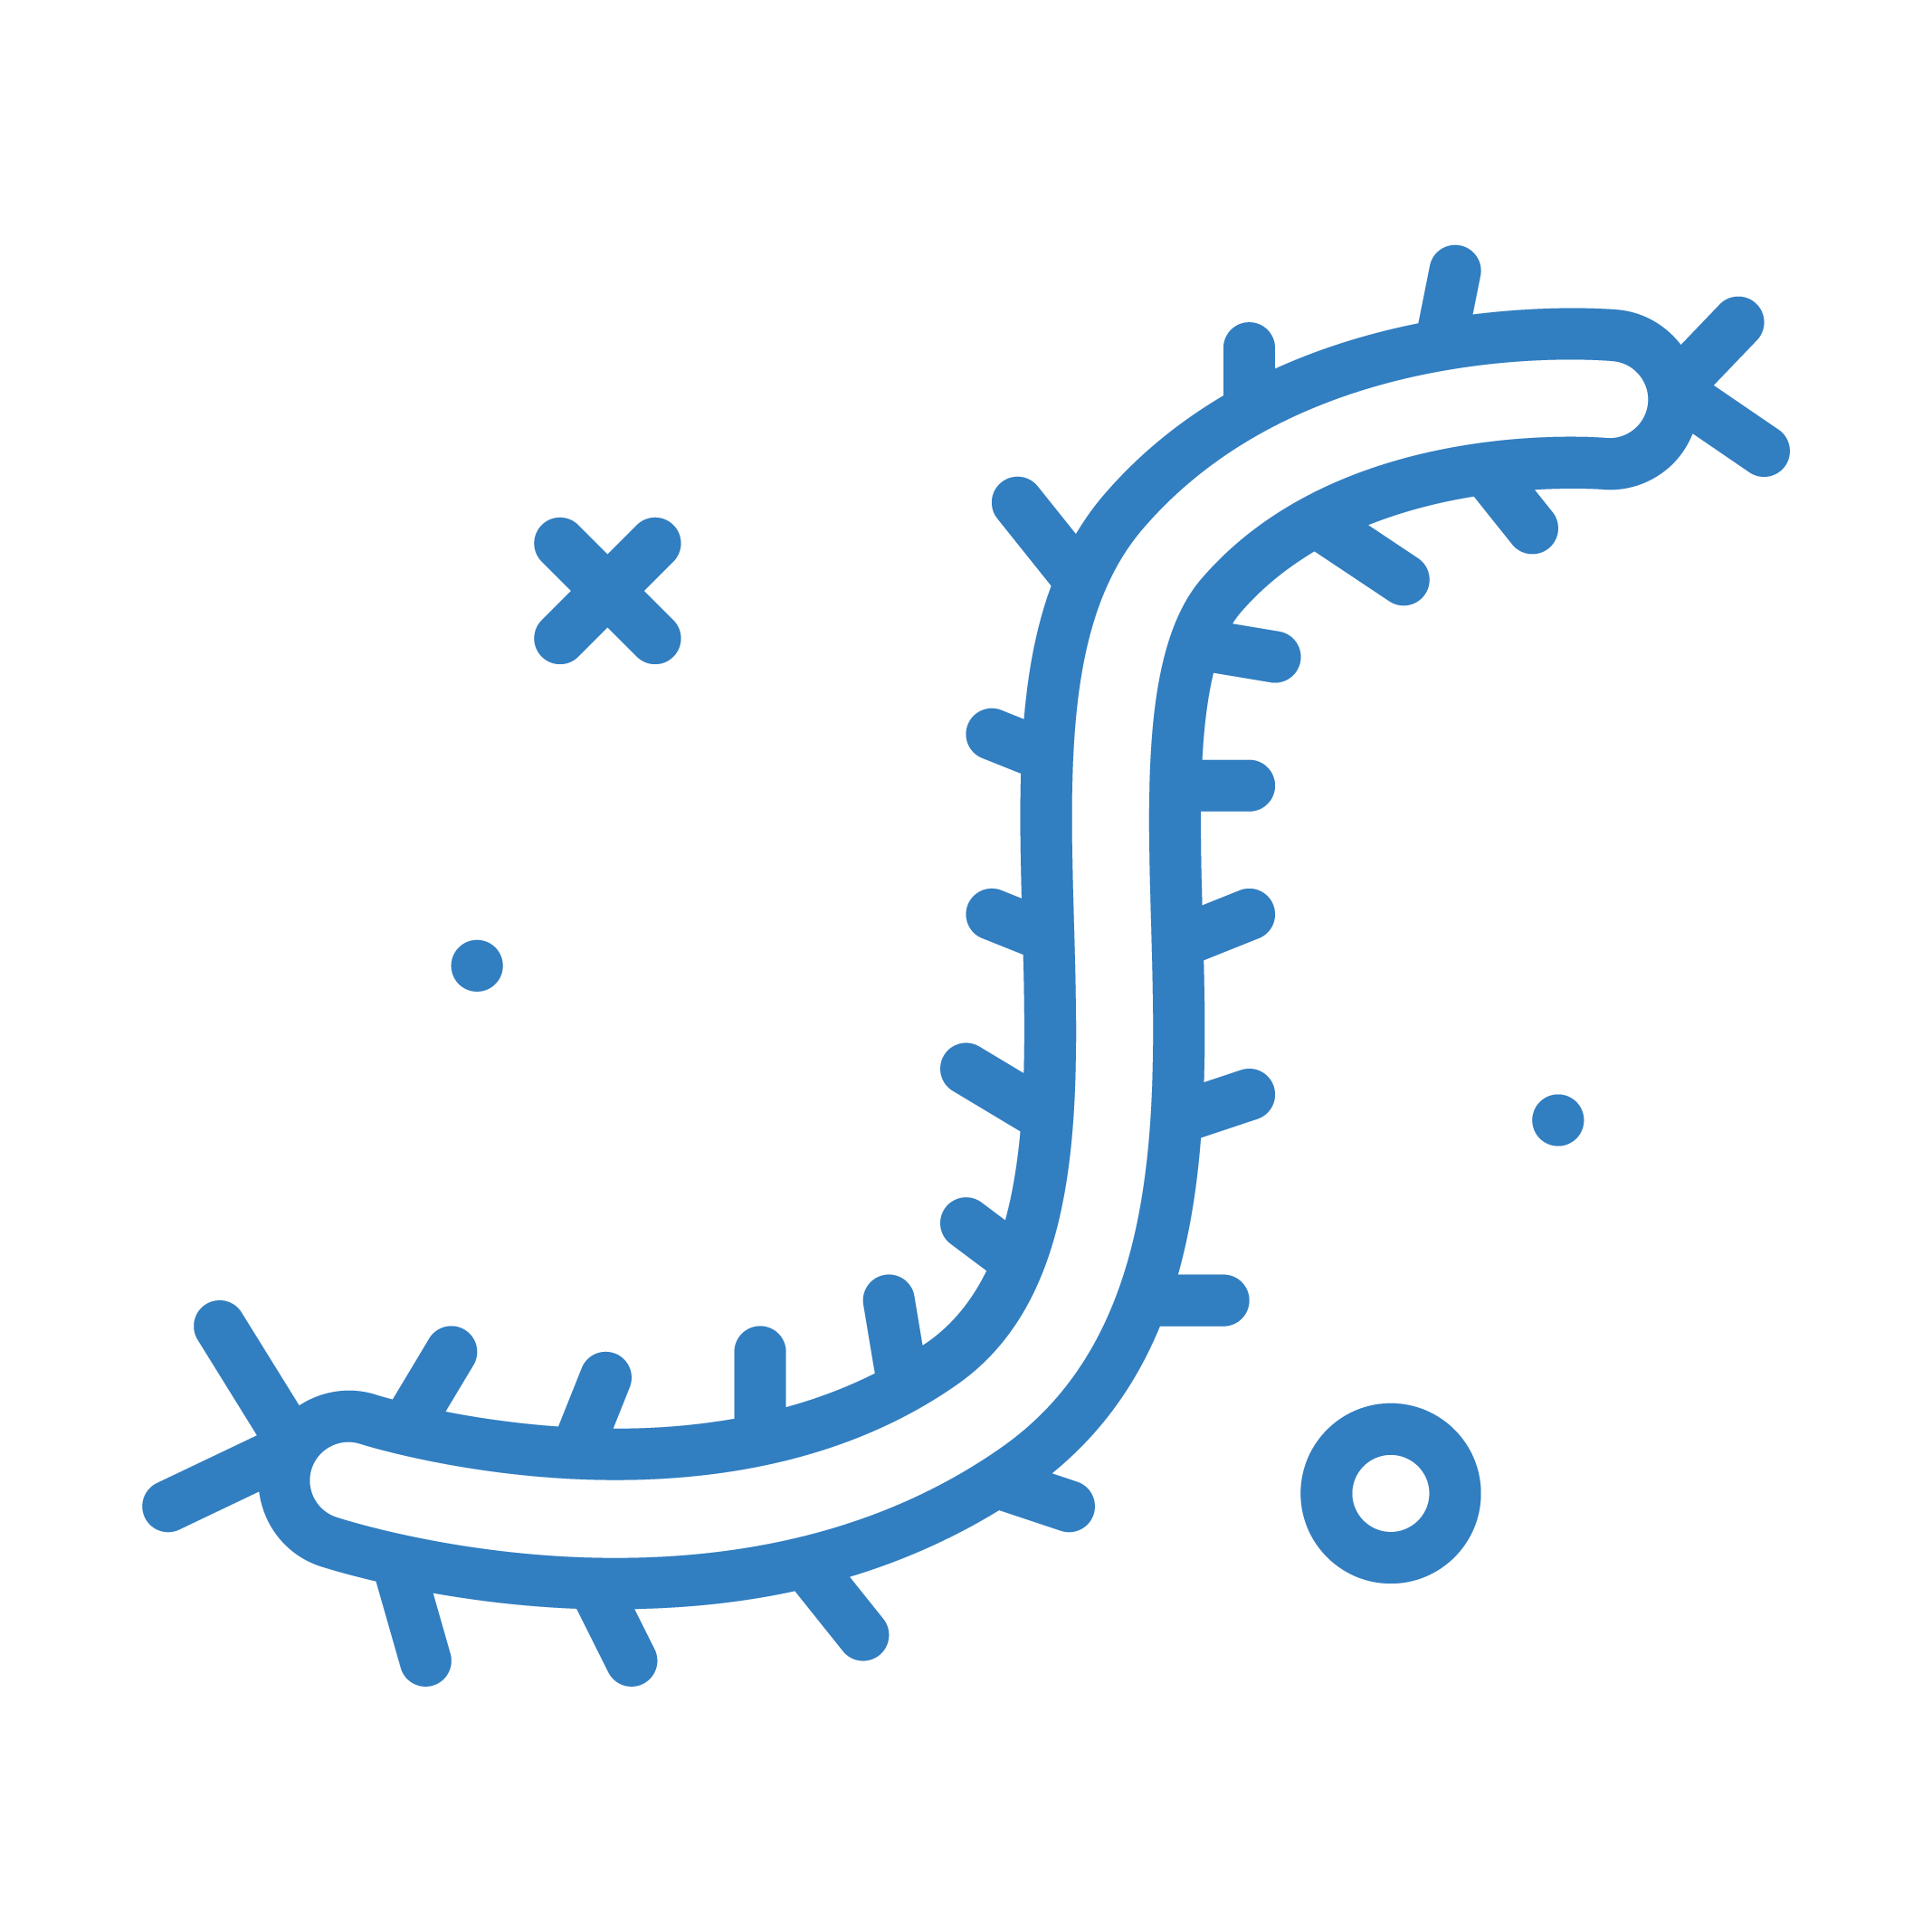 Icona che rappresenta batteri virus e microrganismi